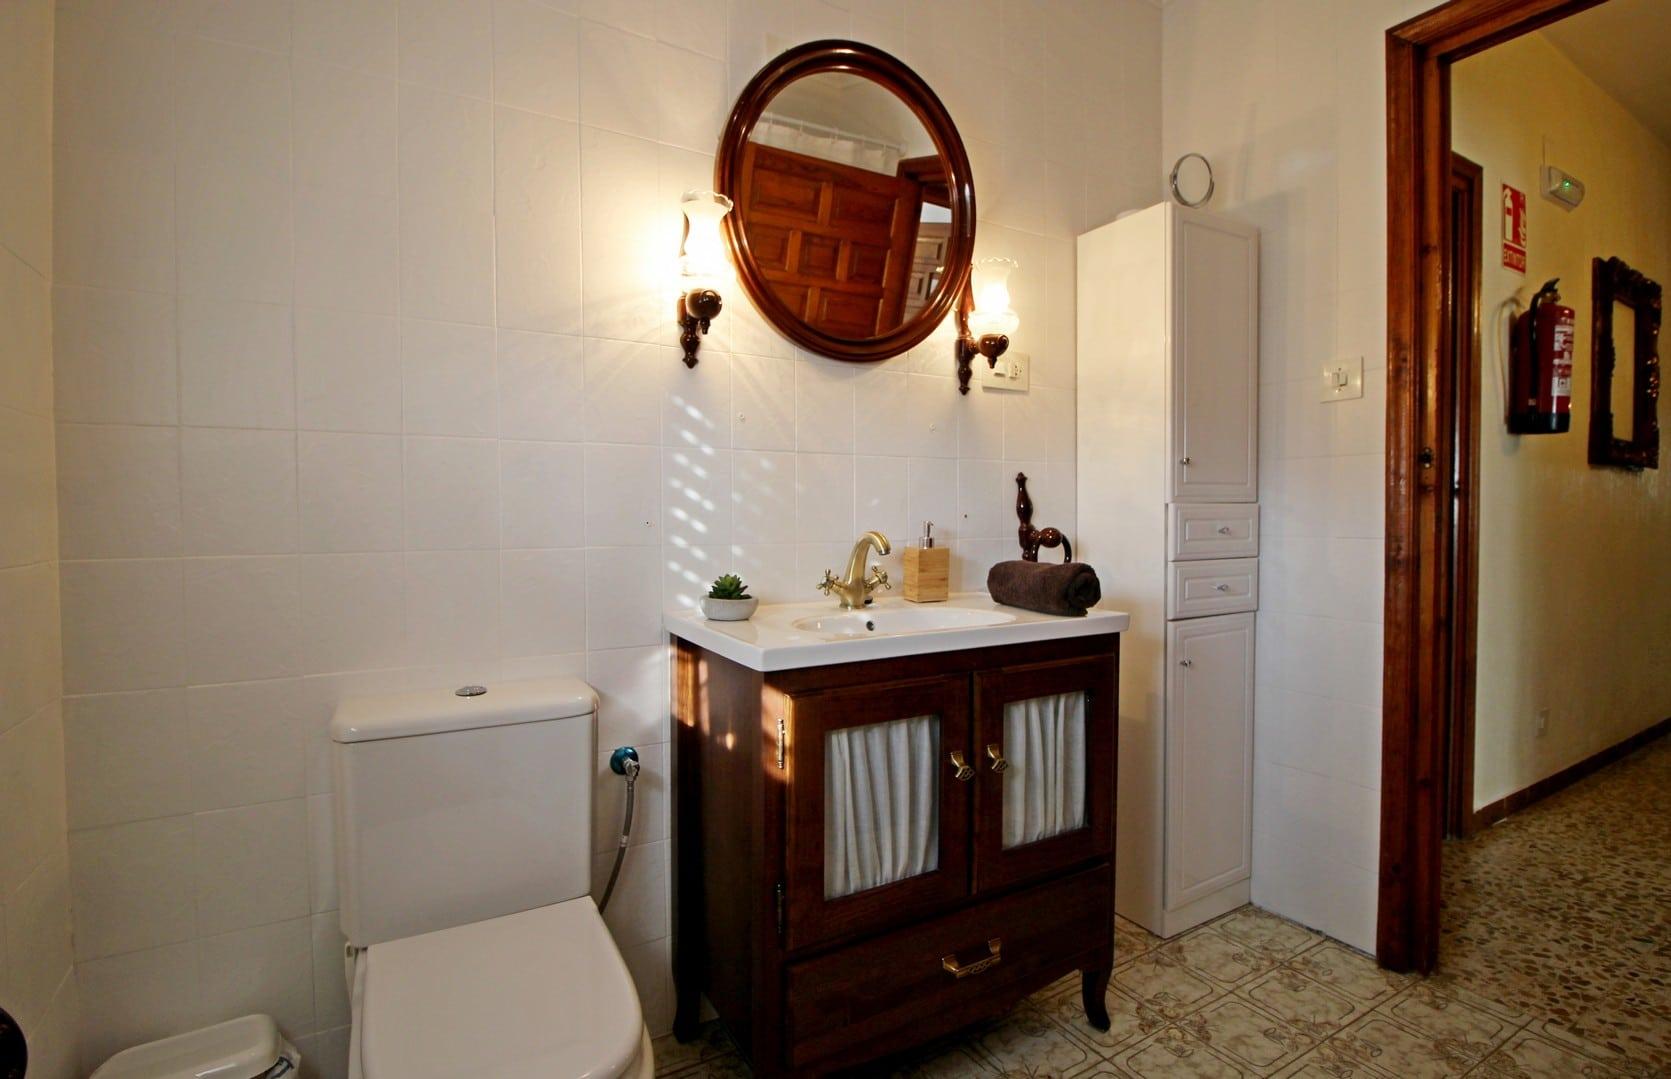 baño1_las_hazas_jarandilla0001